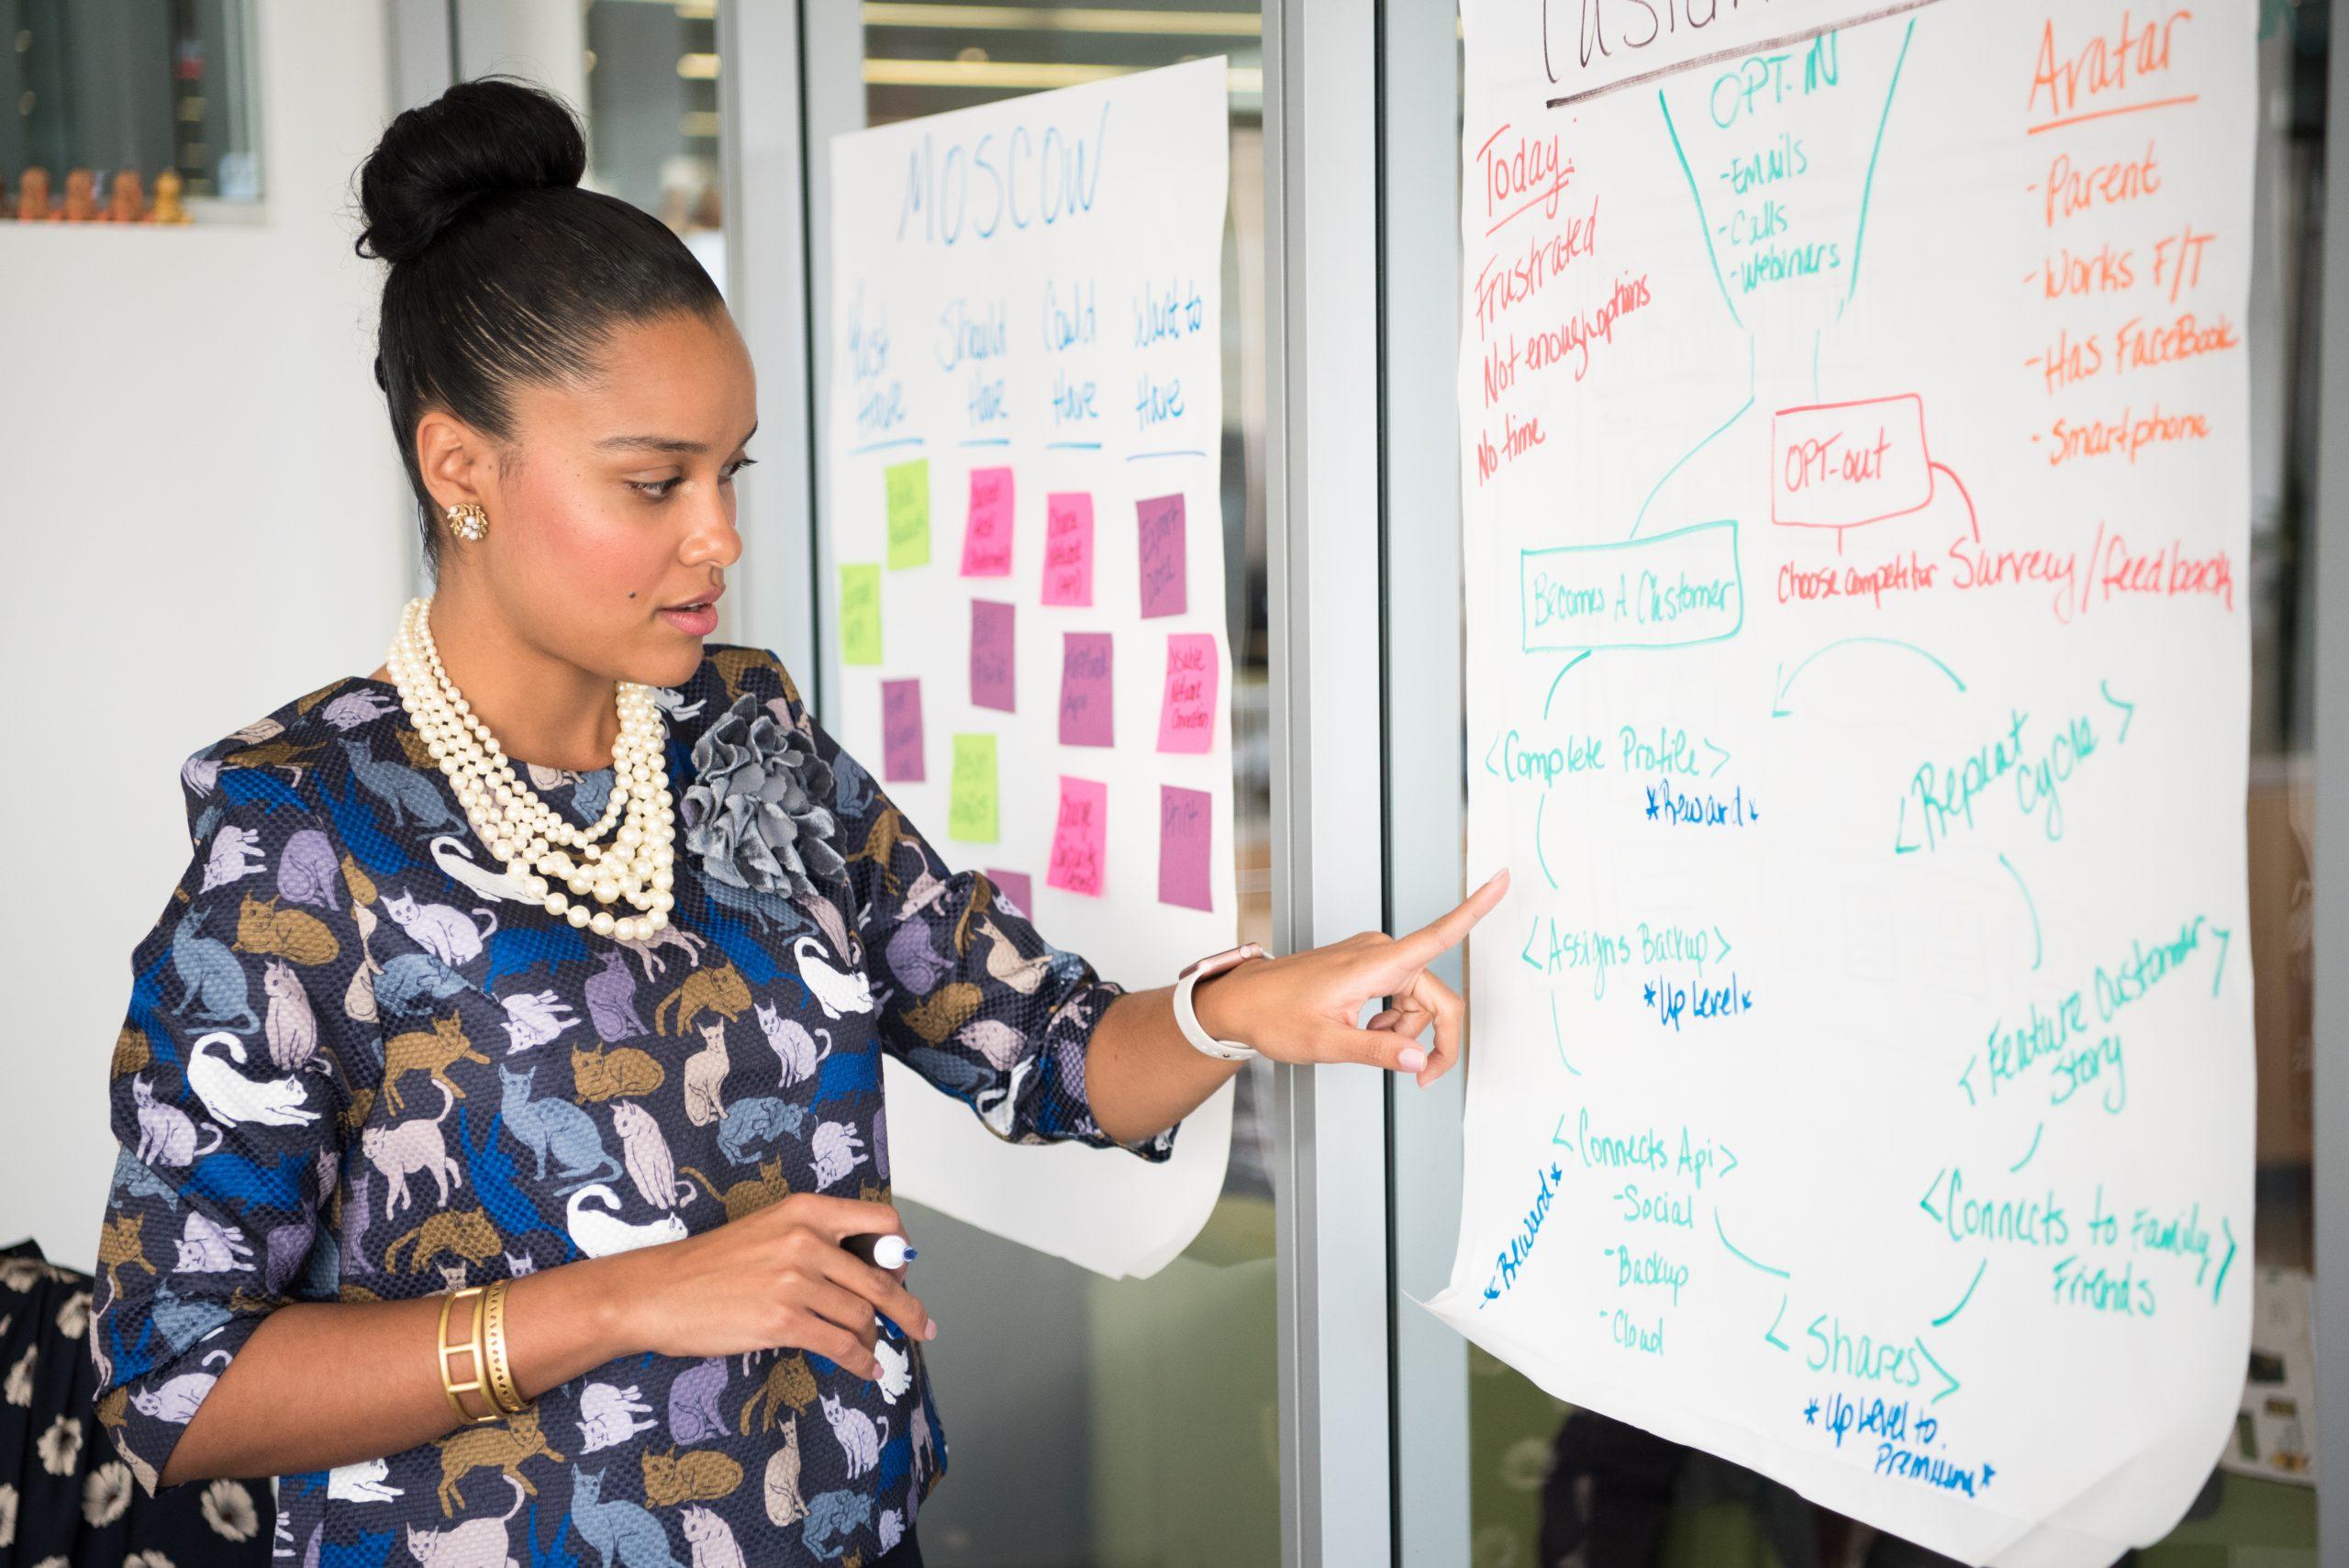 woman developing a strategy